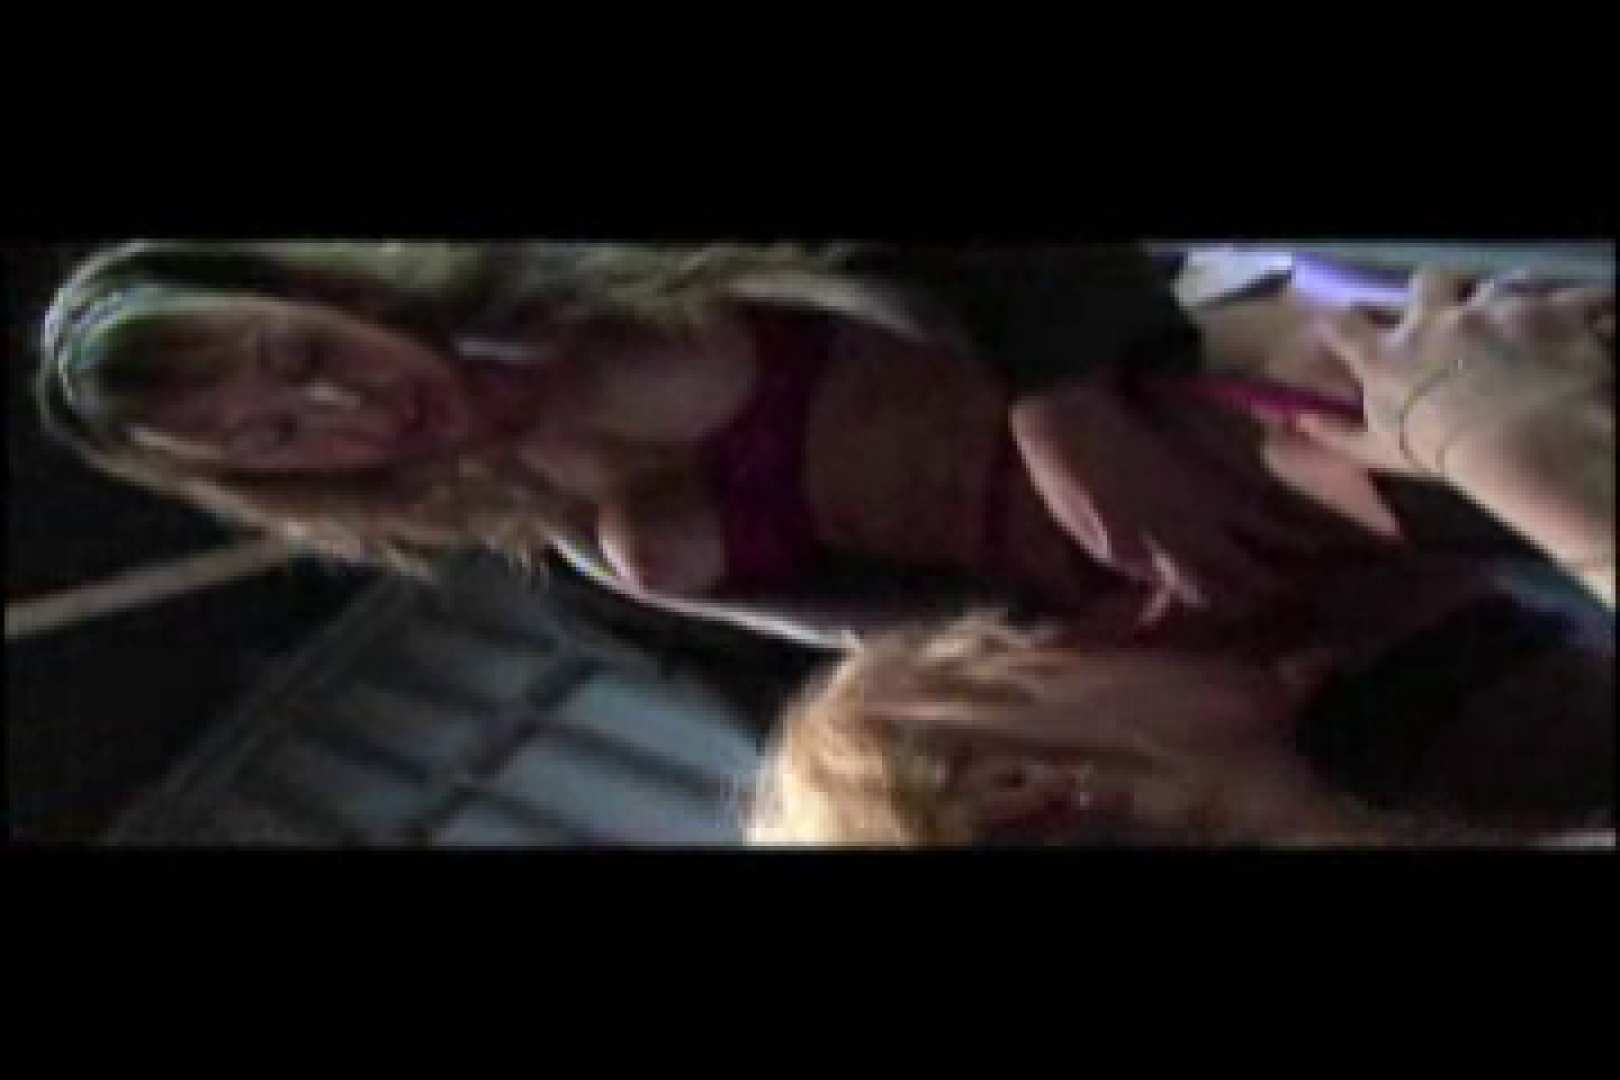 WORLD NEW HALF vol3 ノンケ達のセックス ゲイ無修正画像 54画像 14